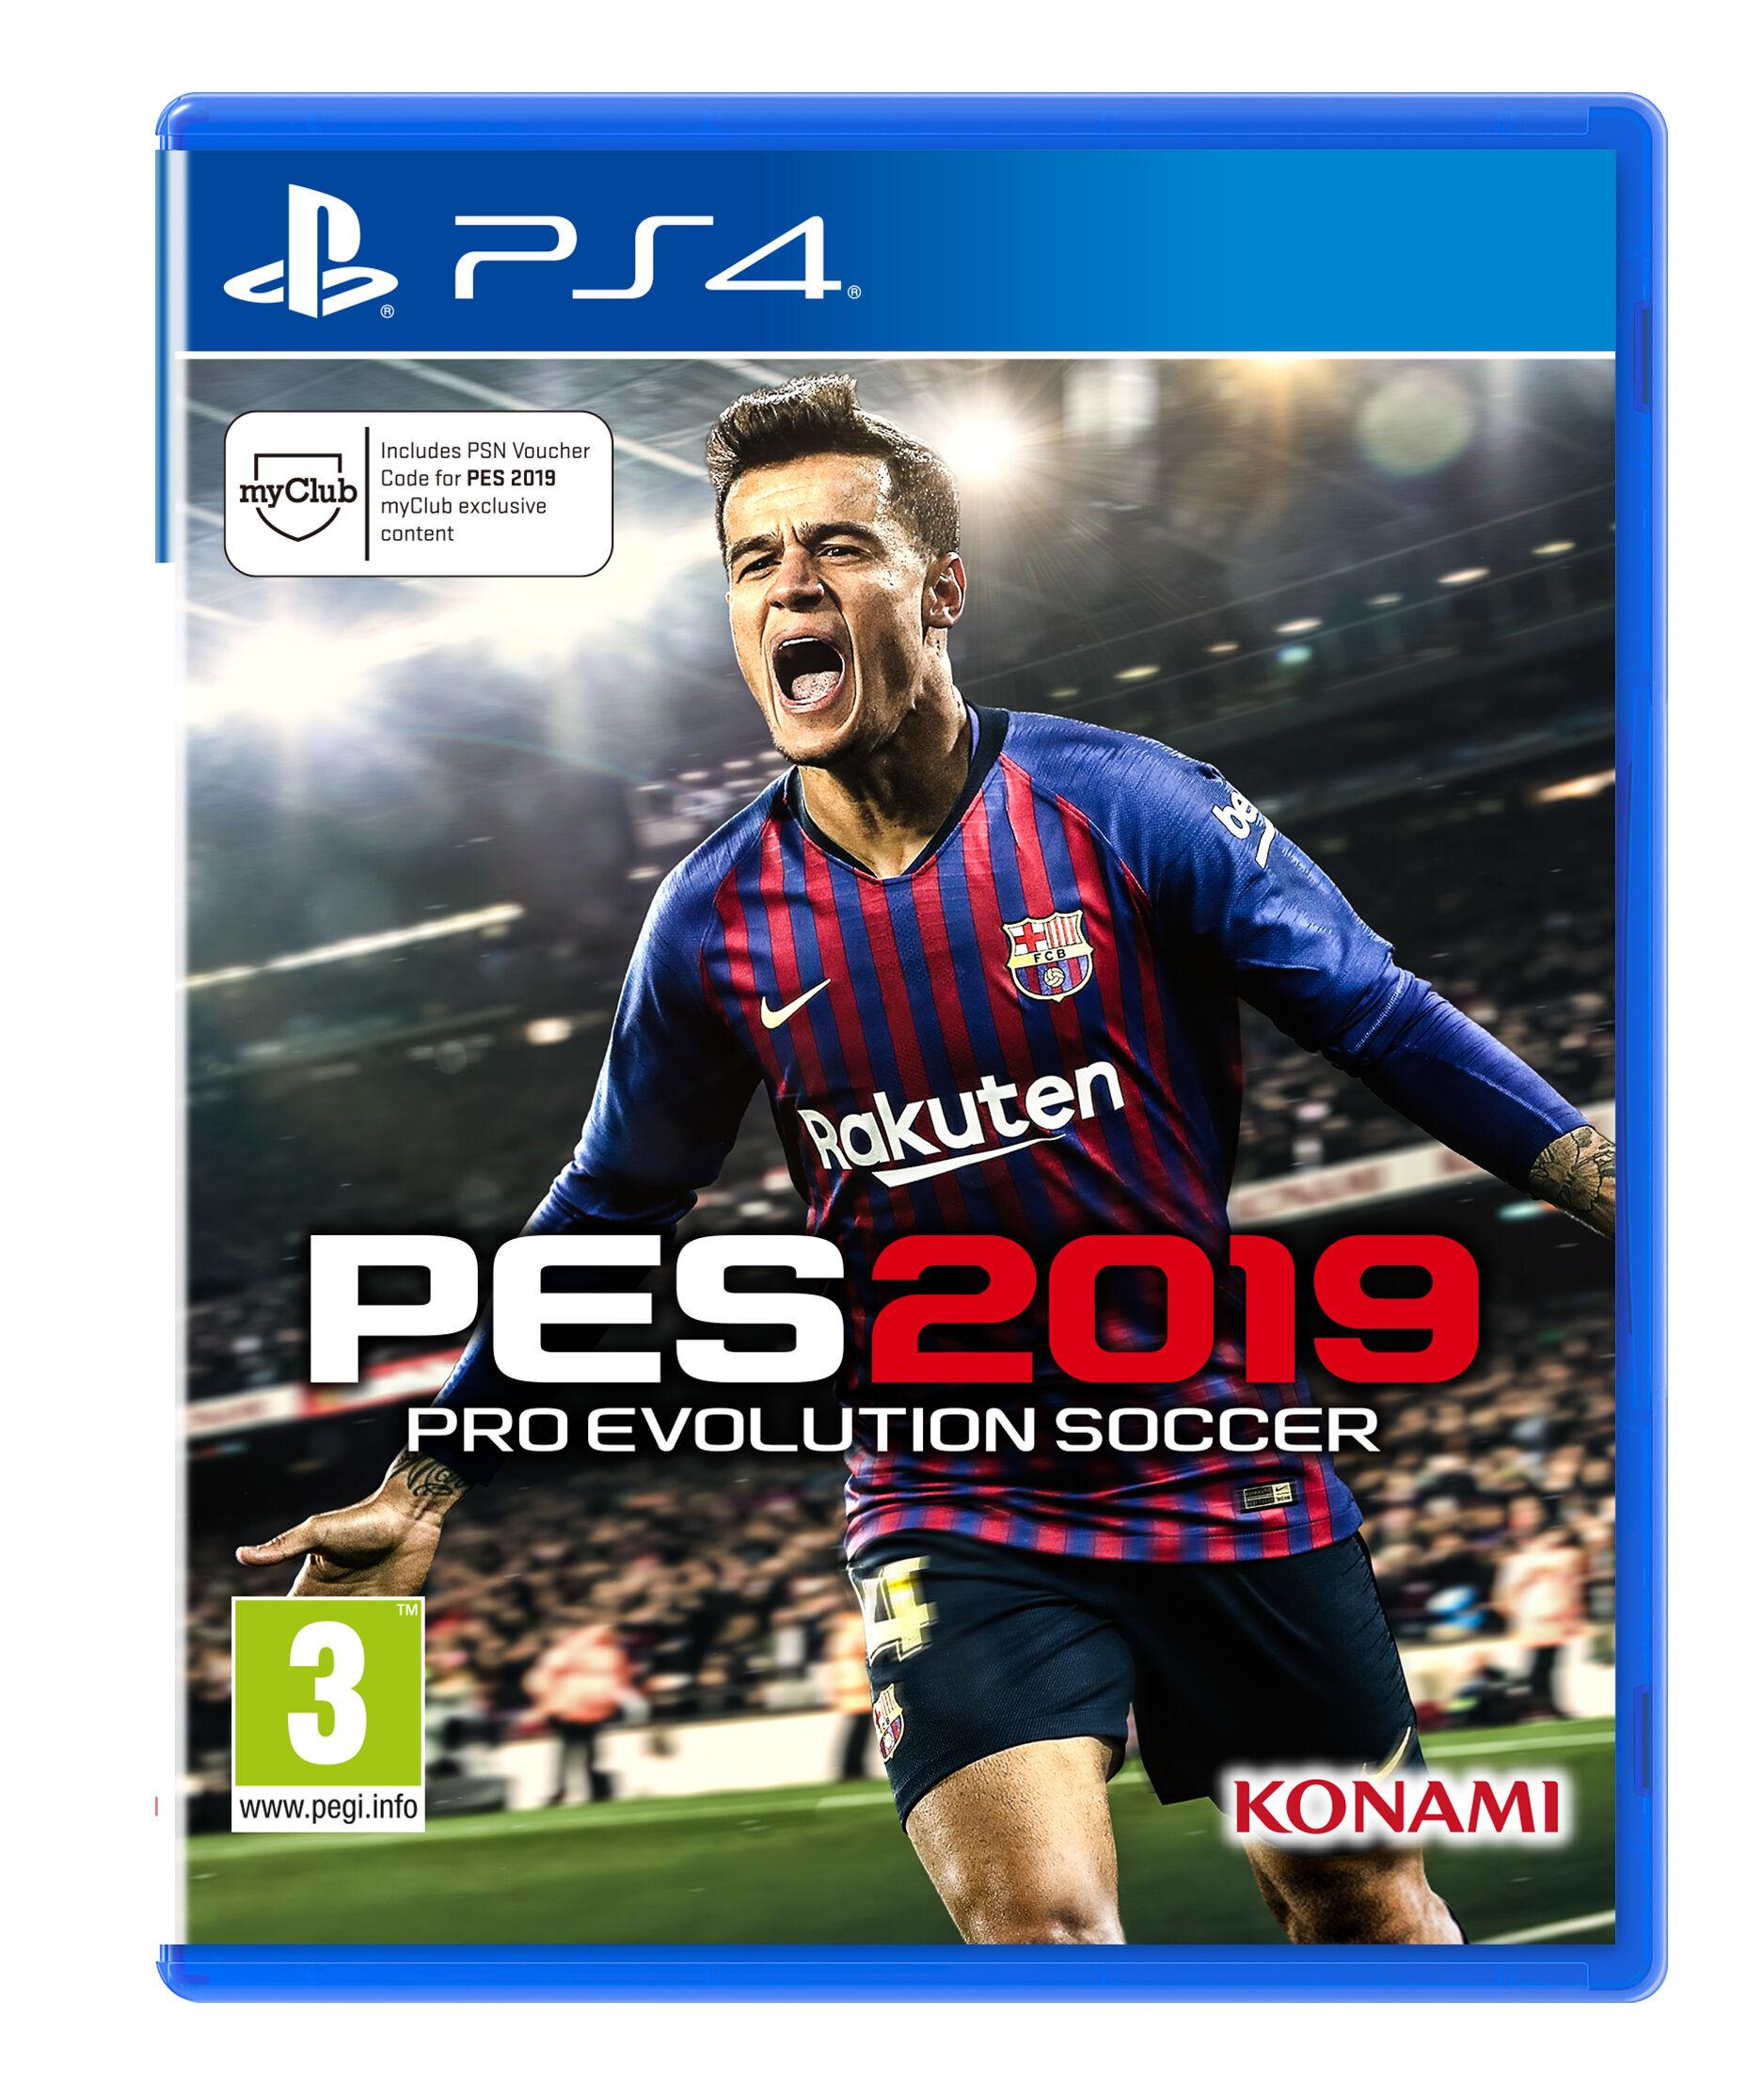 HALIFAX Sony PS4 Pro Evolution Soccer 2019